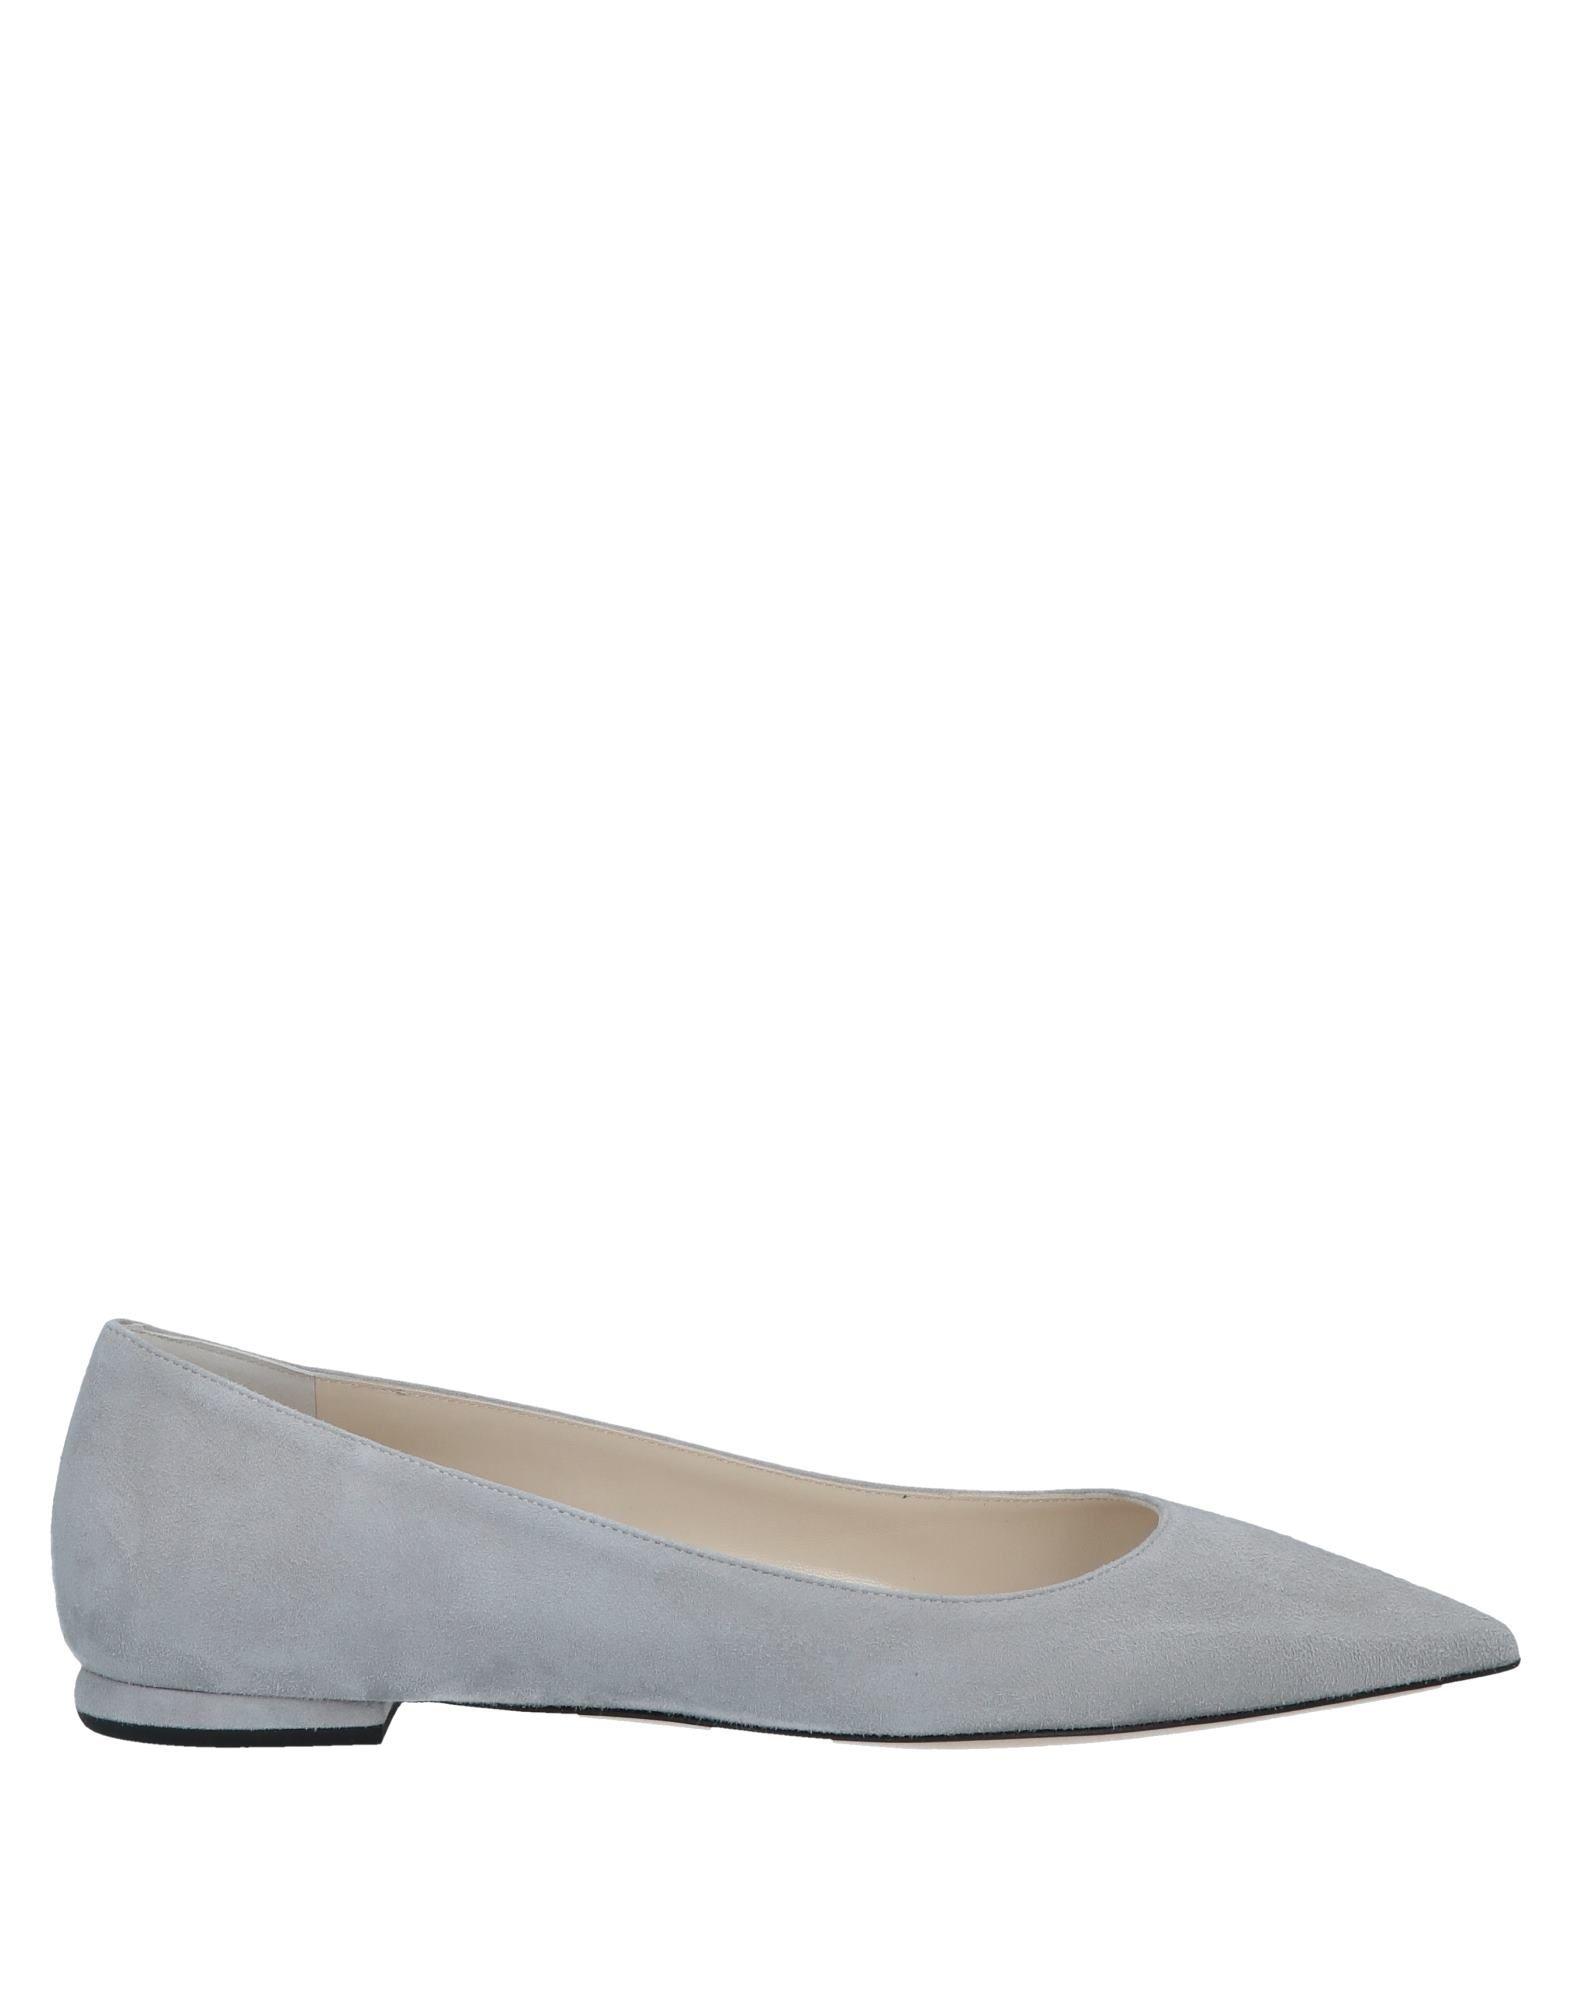 Deimille Ballet Flats In Light Grey